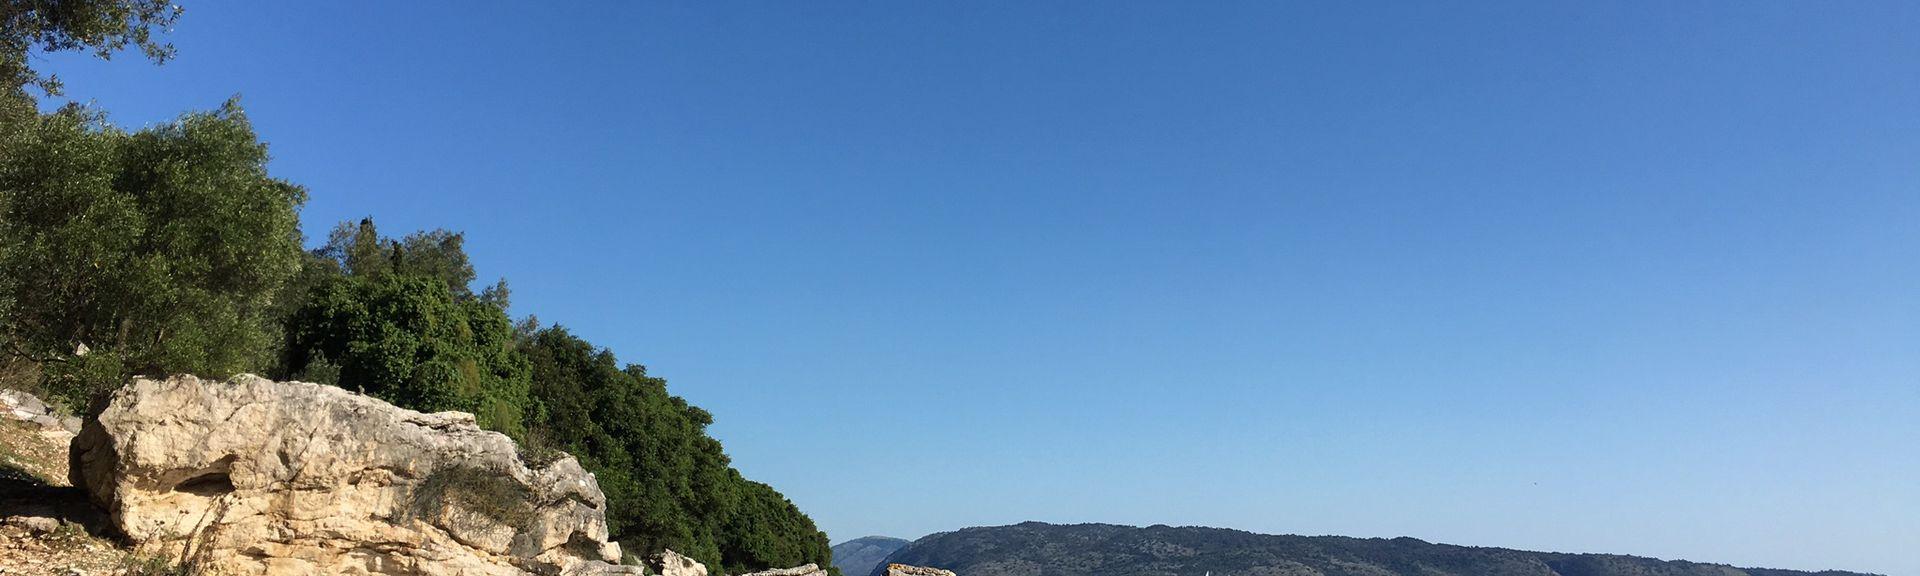 Epiro, Grecia